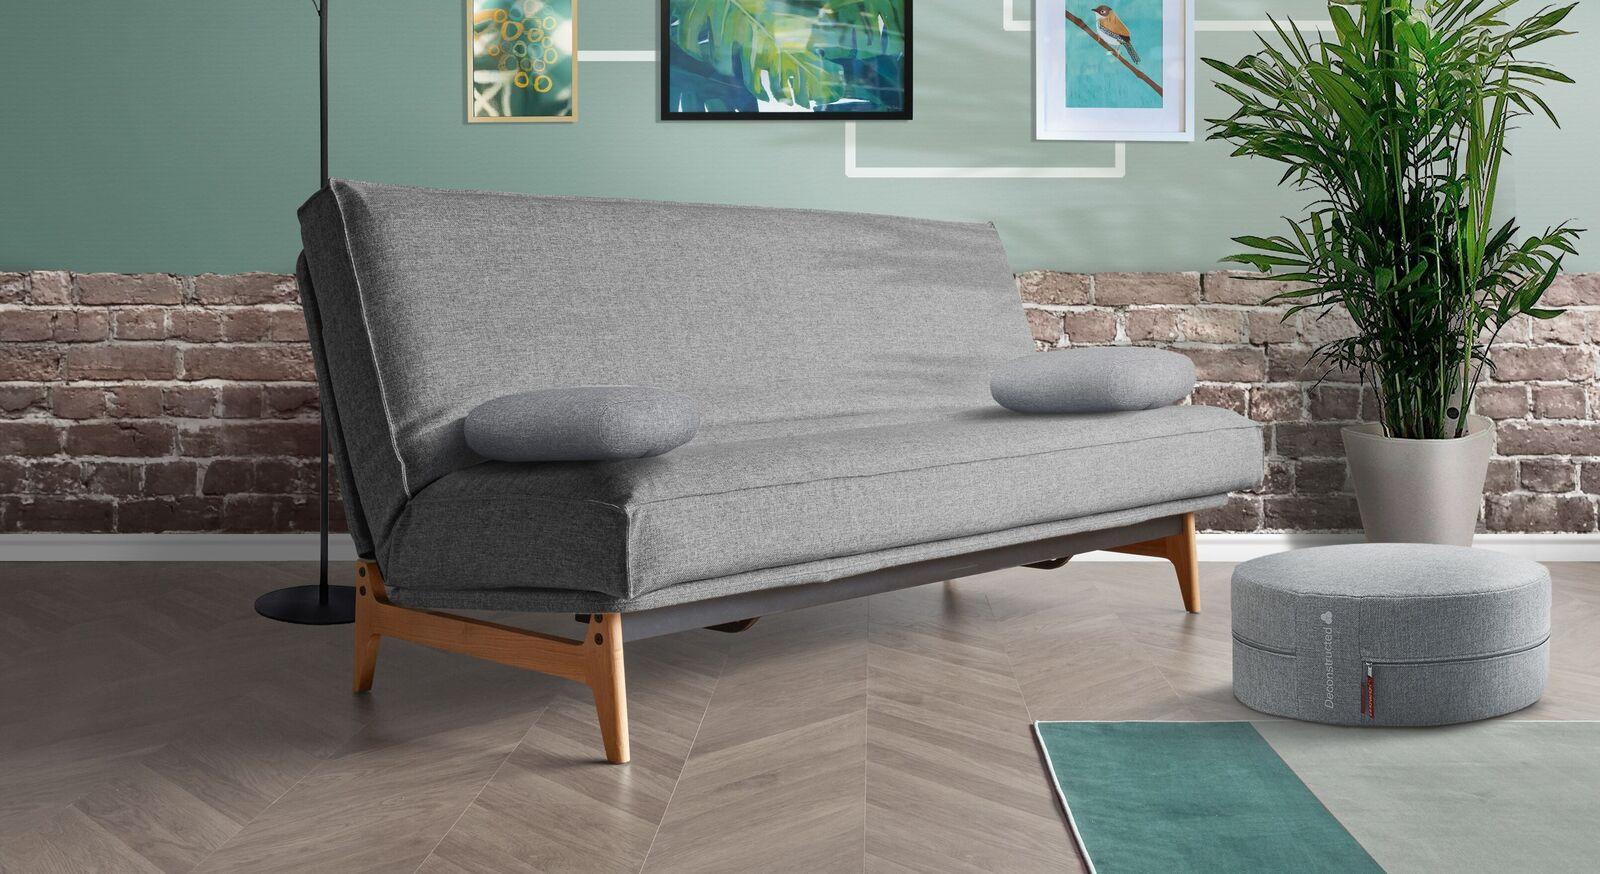 Schlafsofa Atessa im modern Loft-Style